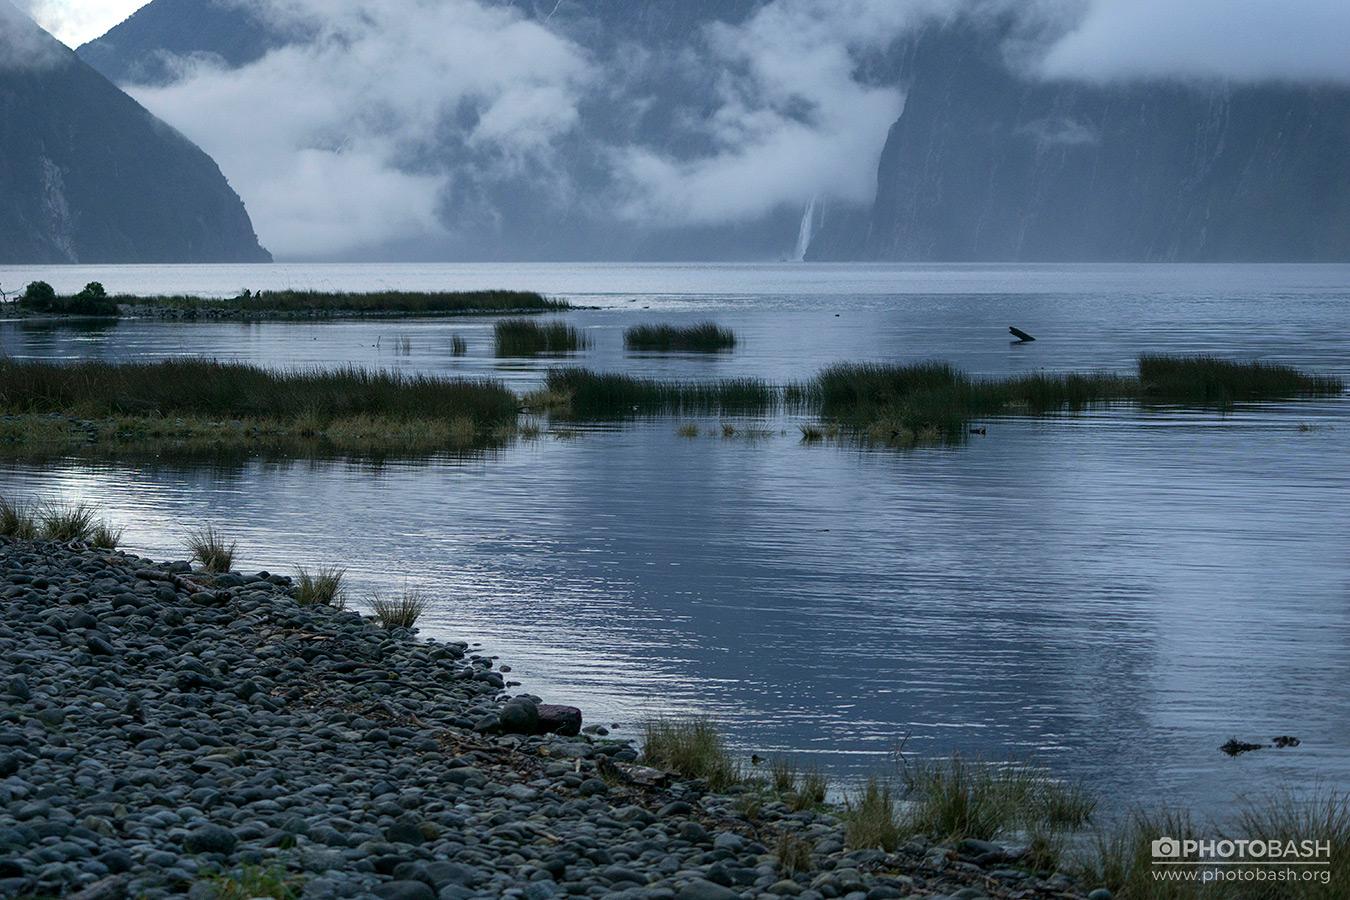 Misty-Lagoon-Foggy-Dark-Lake.jpg